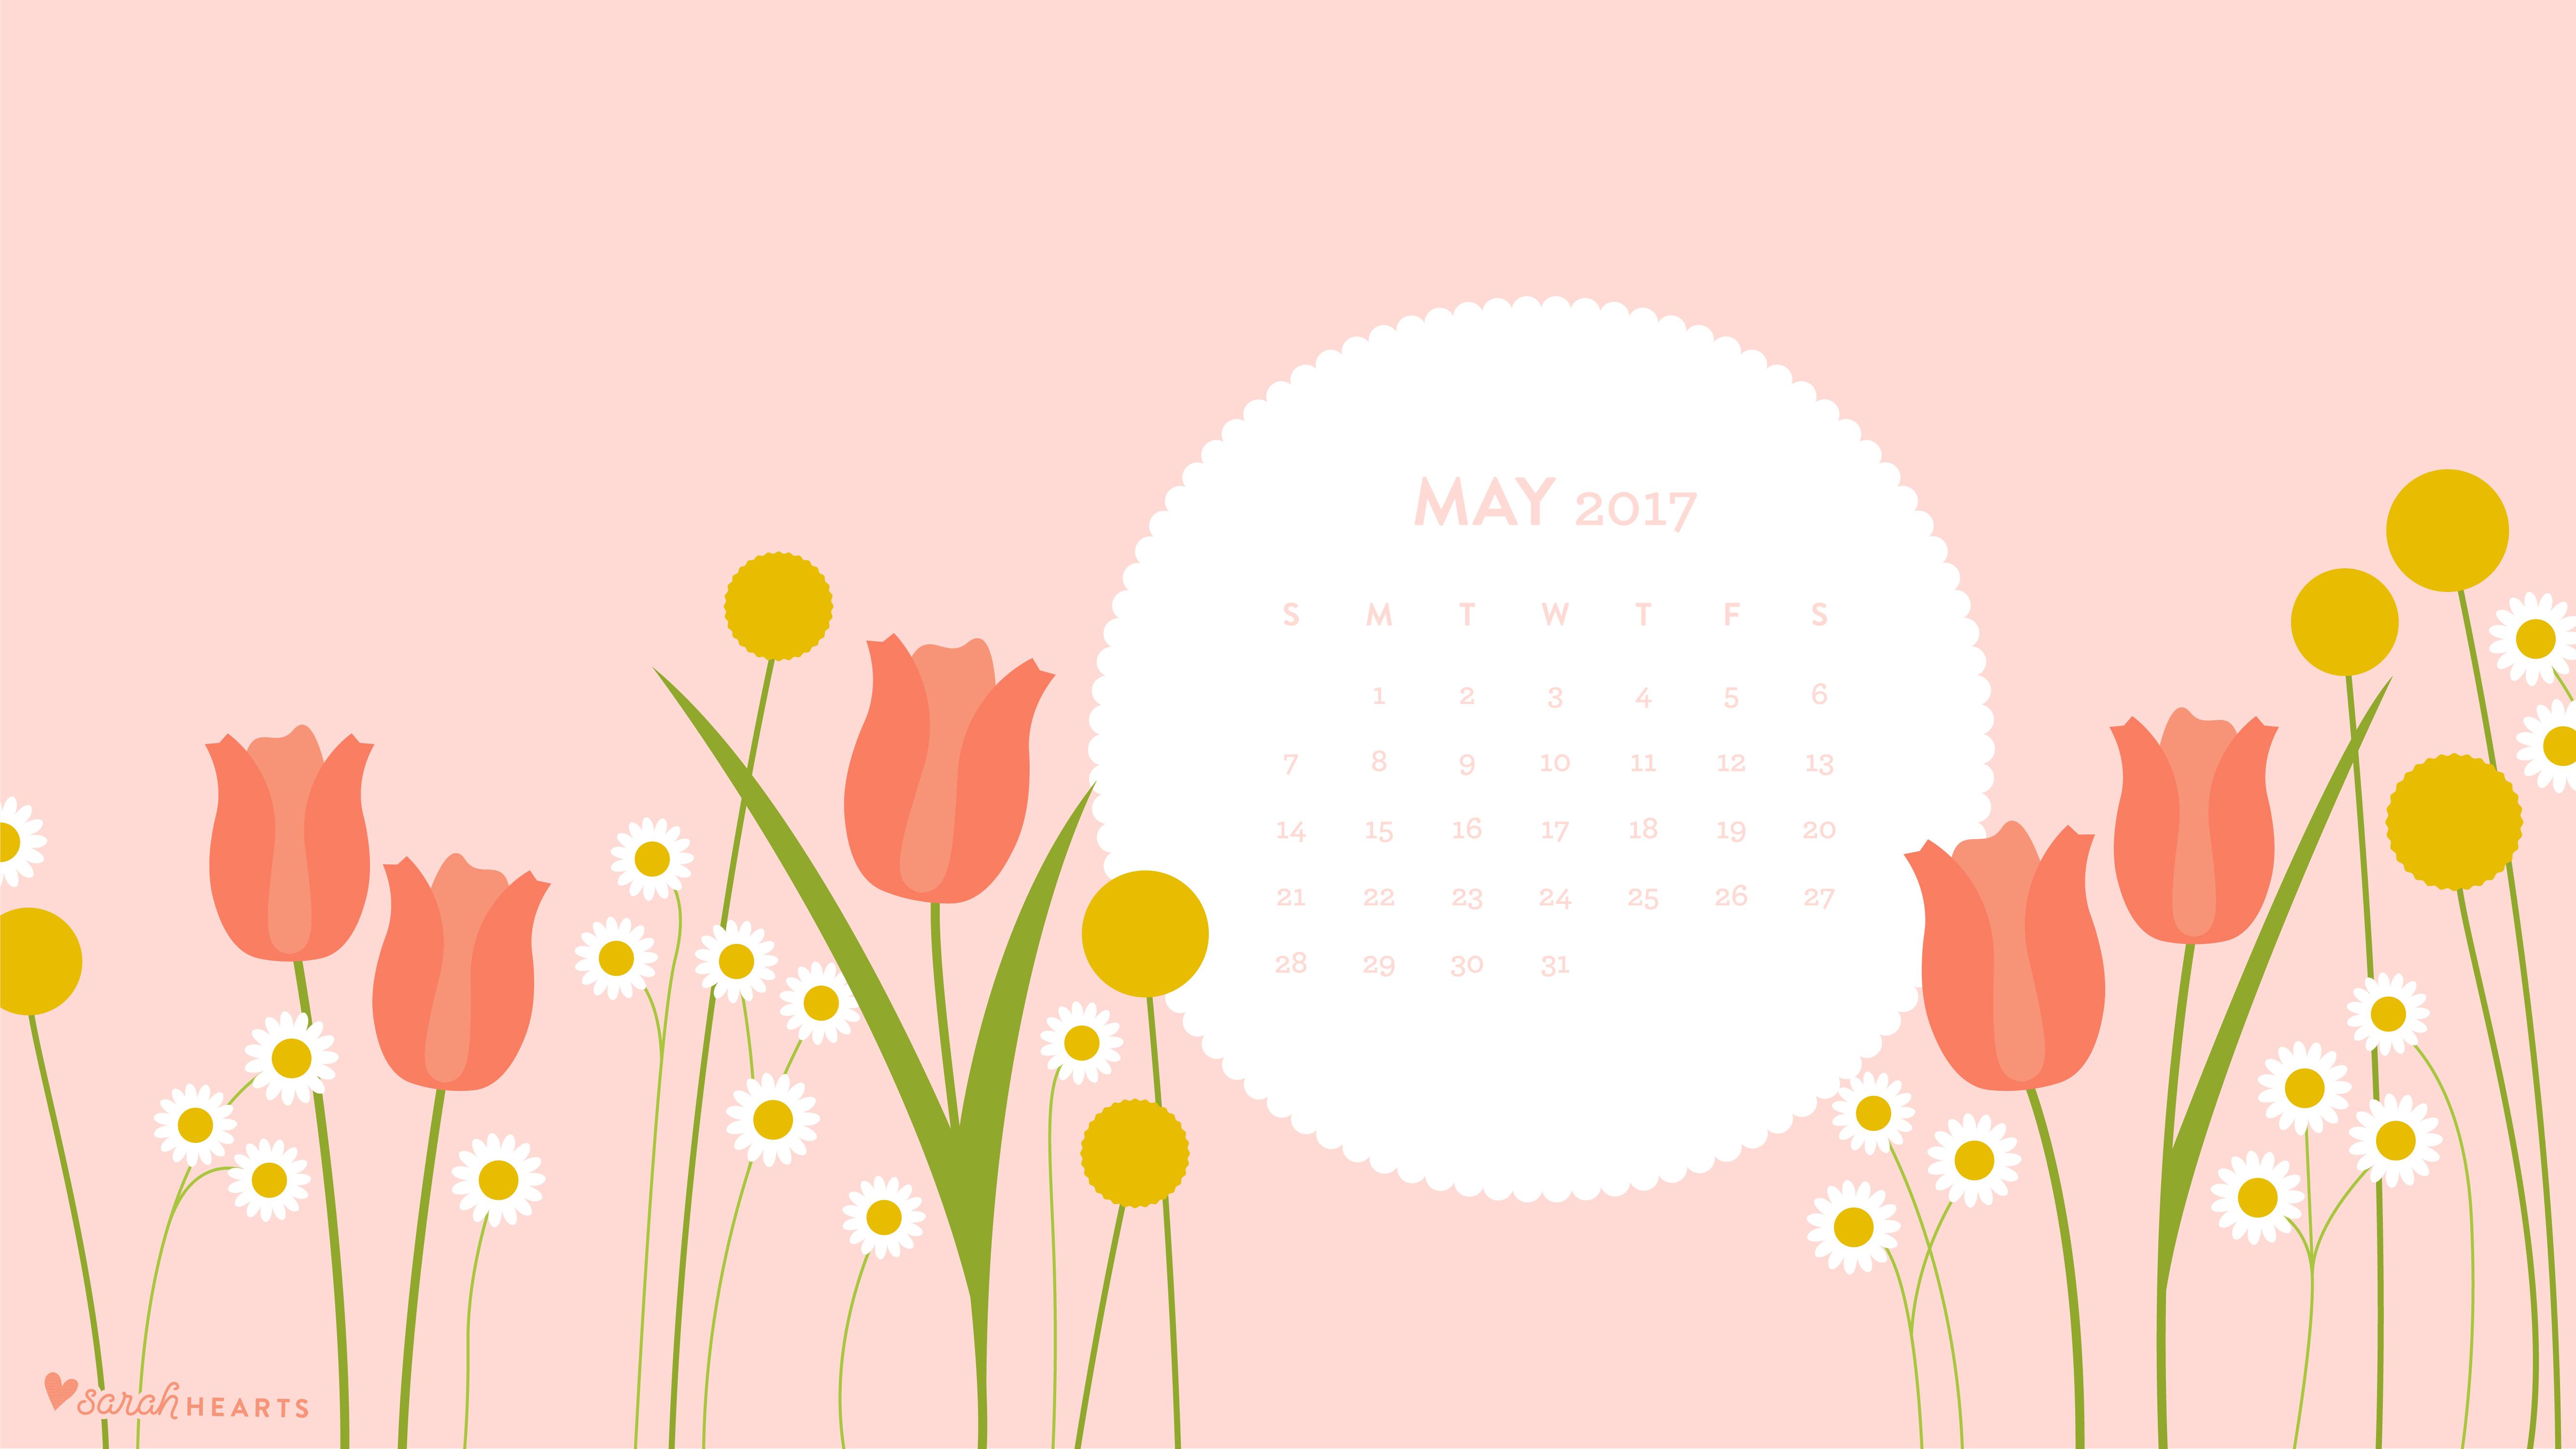 Pretty Quote Wallpapers May 2017 Calendar Wallpaper Sarah Hearts